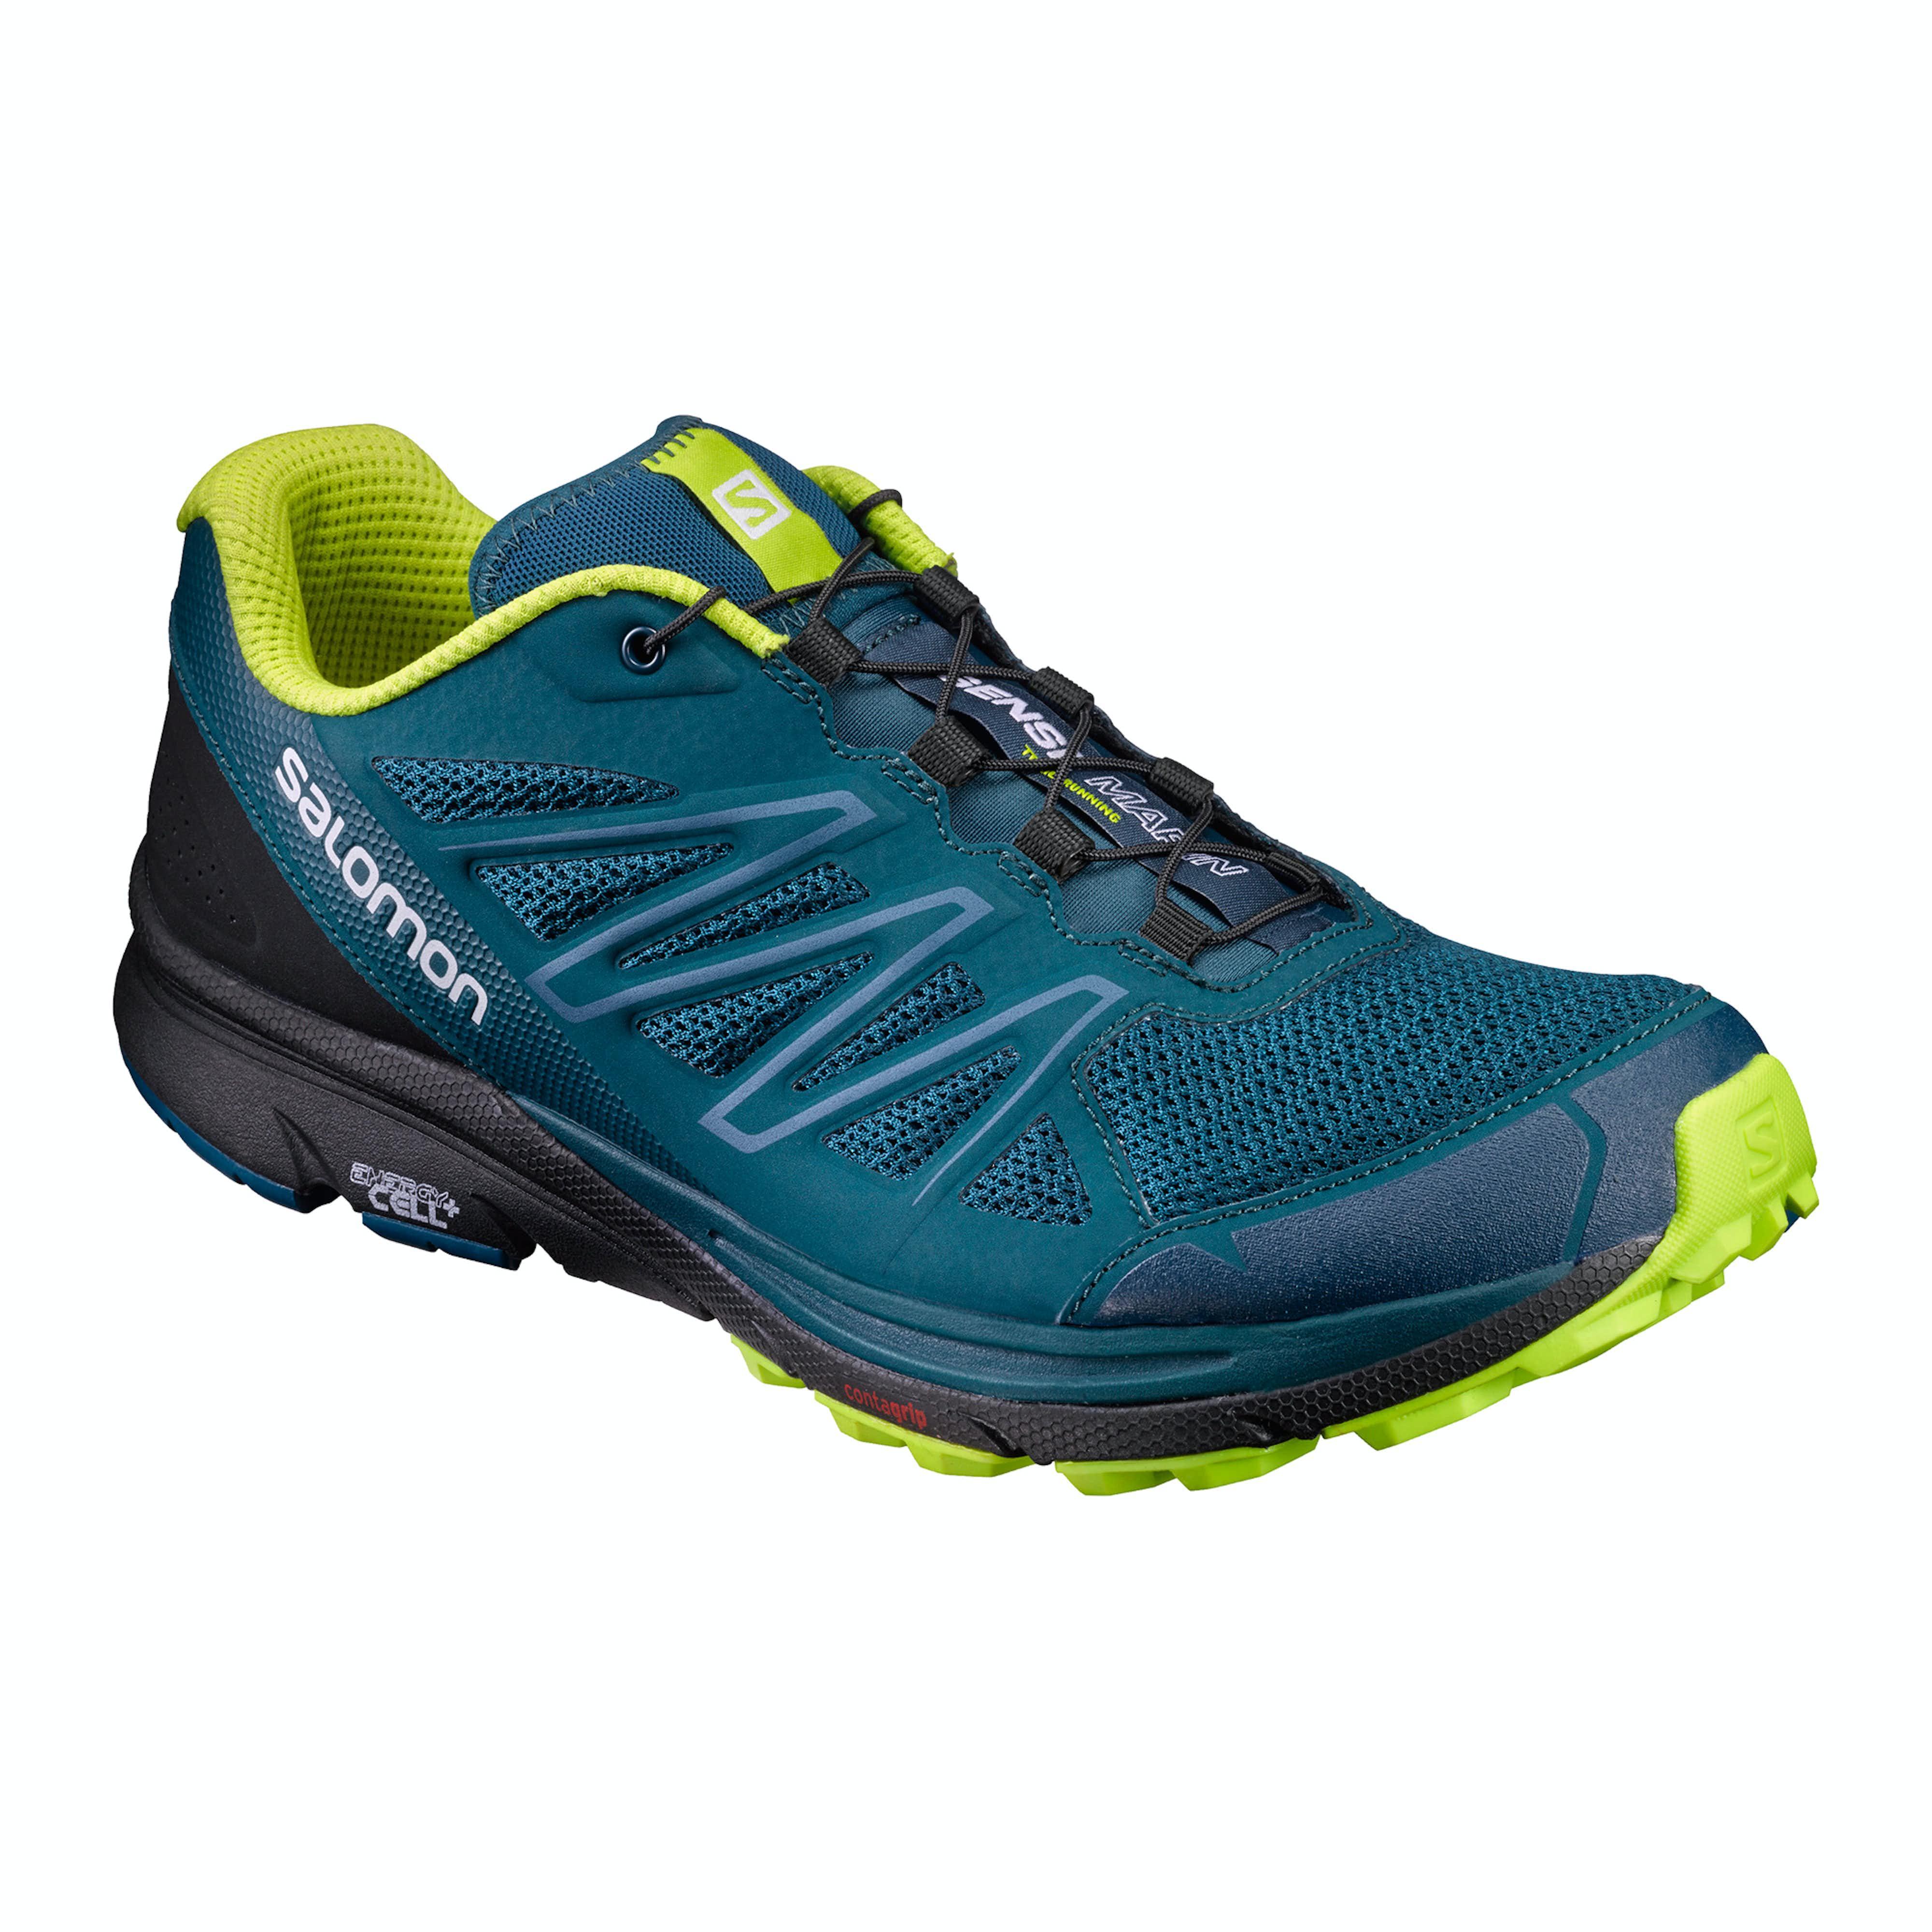 7673f1e2066d Salomon Sense Marin Men · Salomon Sense Marin Men s Trail Running Shoes